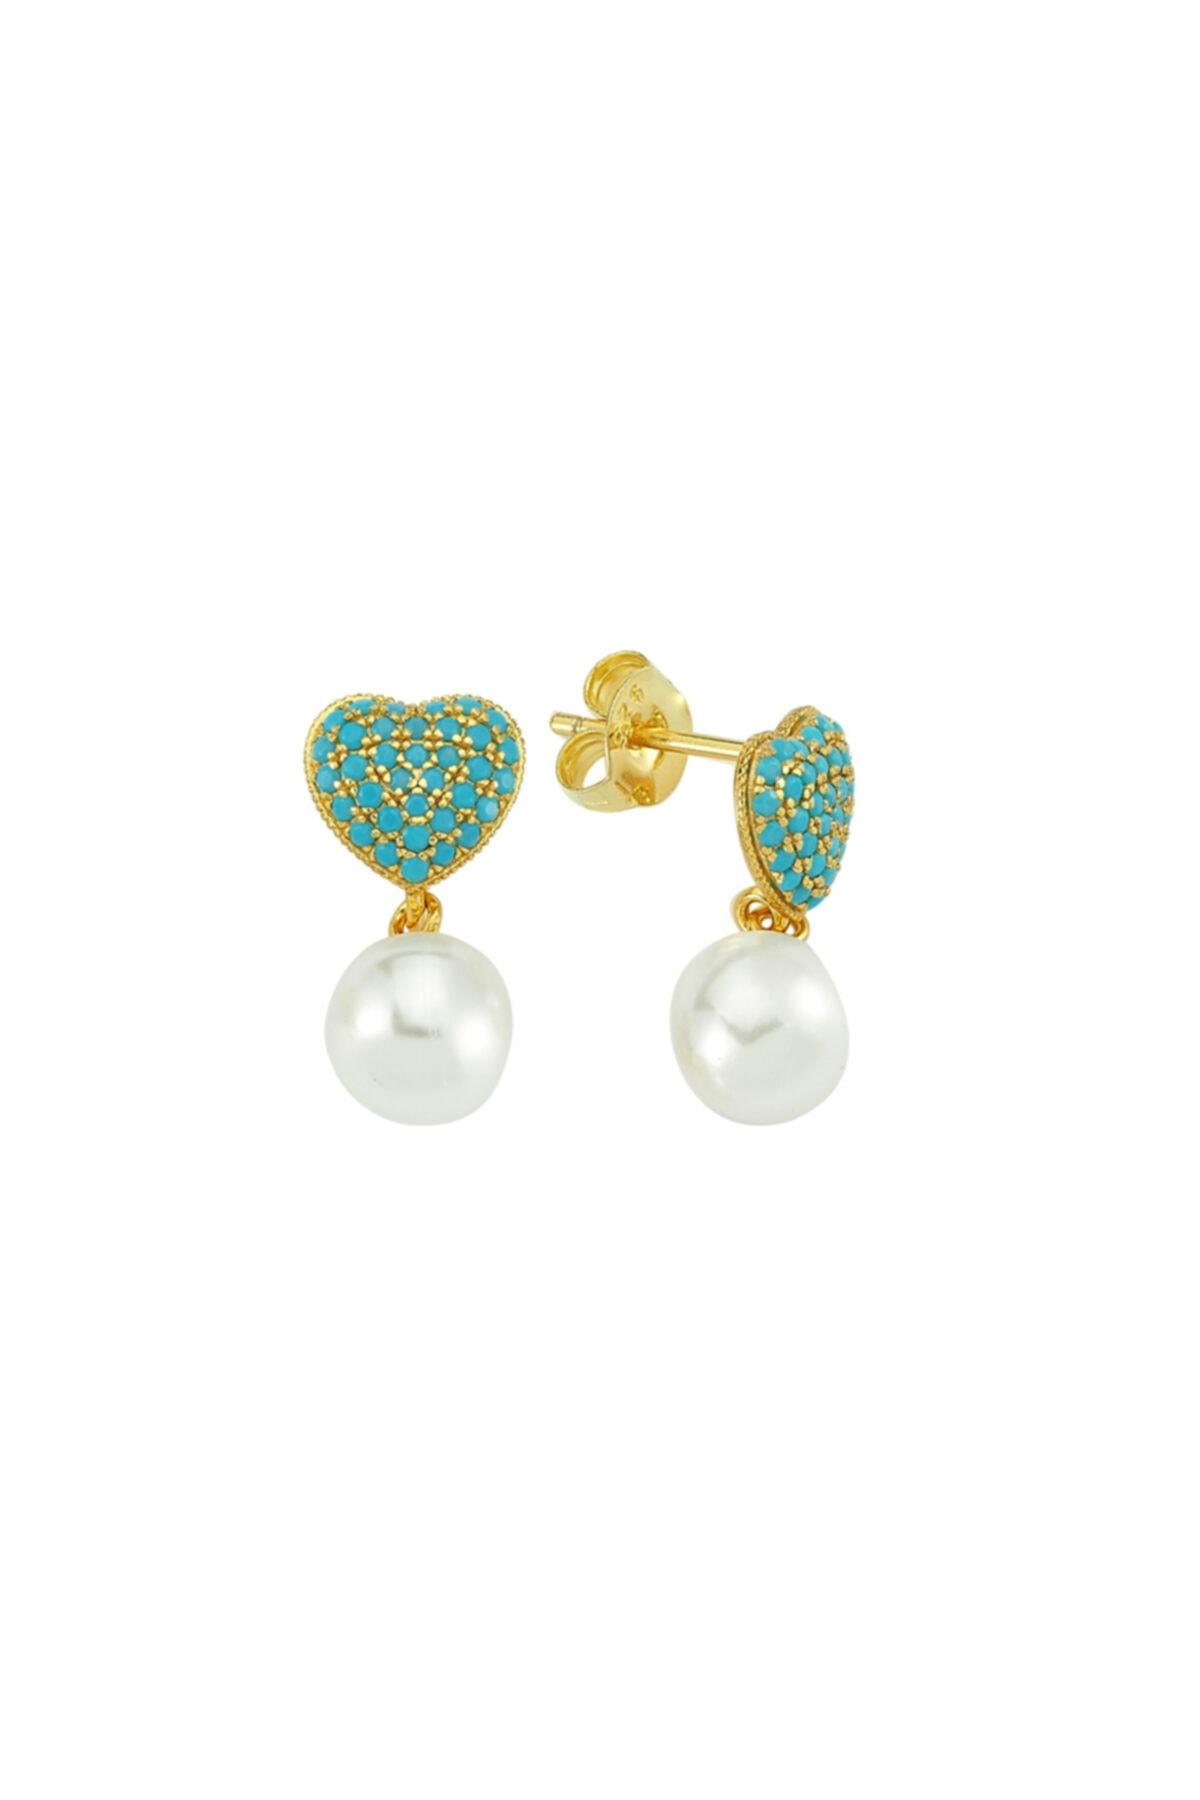 Luzdemia Turquoise Heart Earr. 925 1